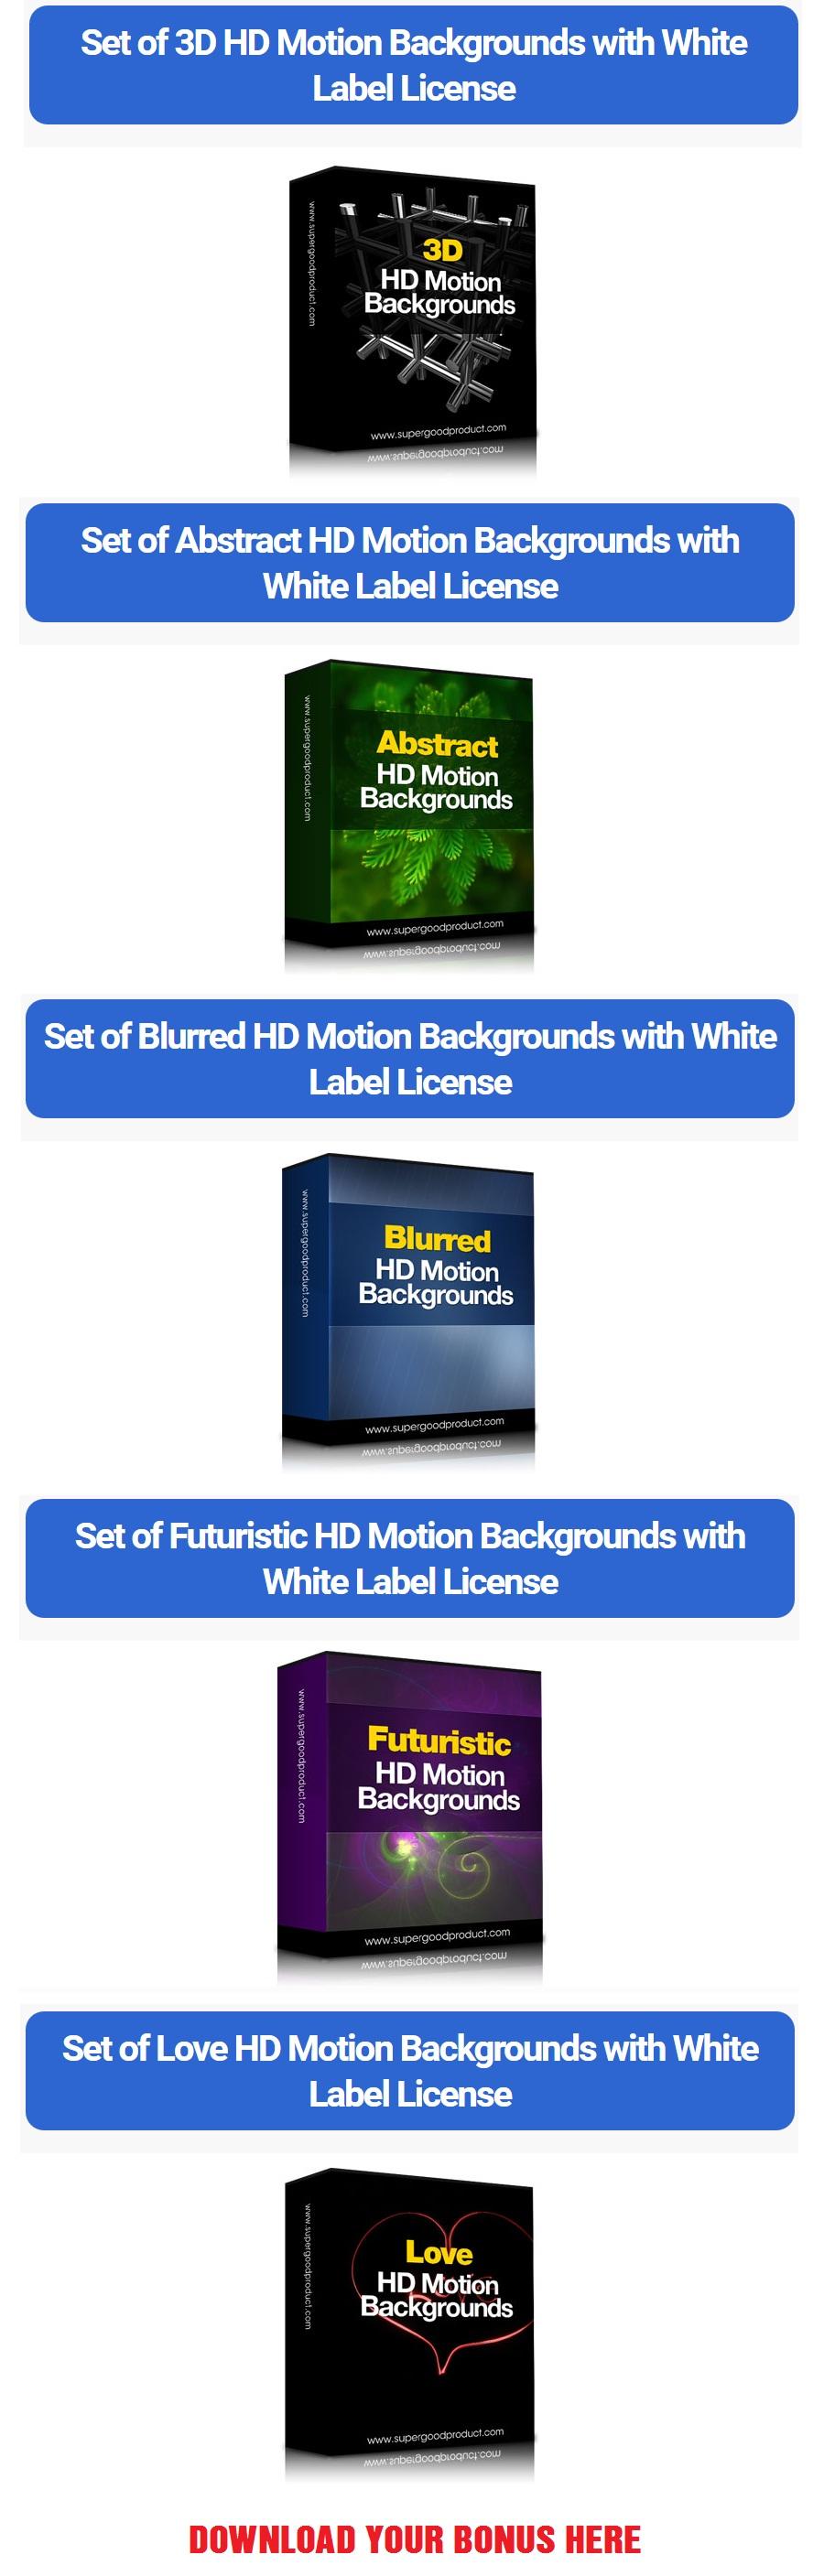 Ultimate Transparent Stock Photos Bonuses